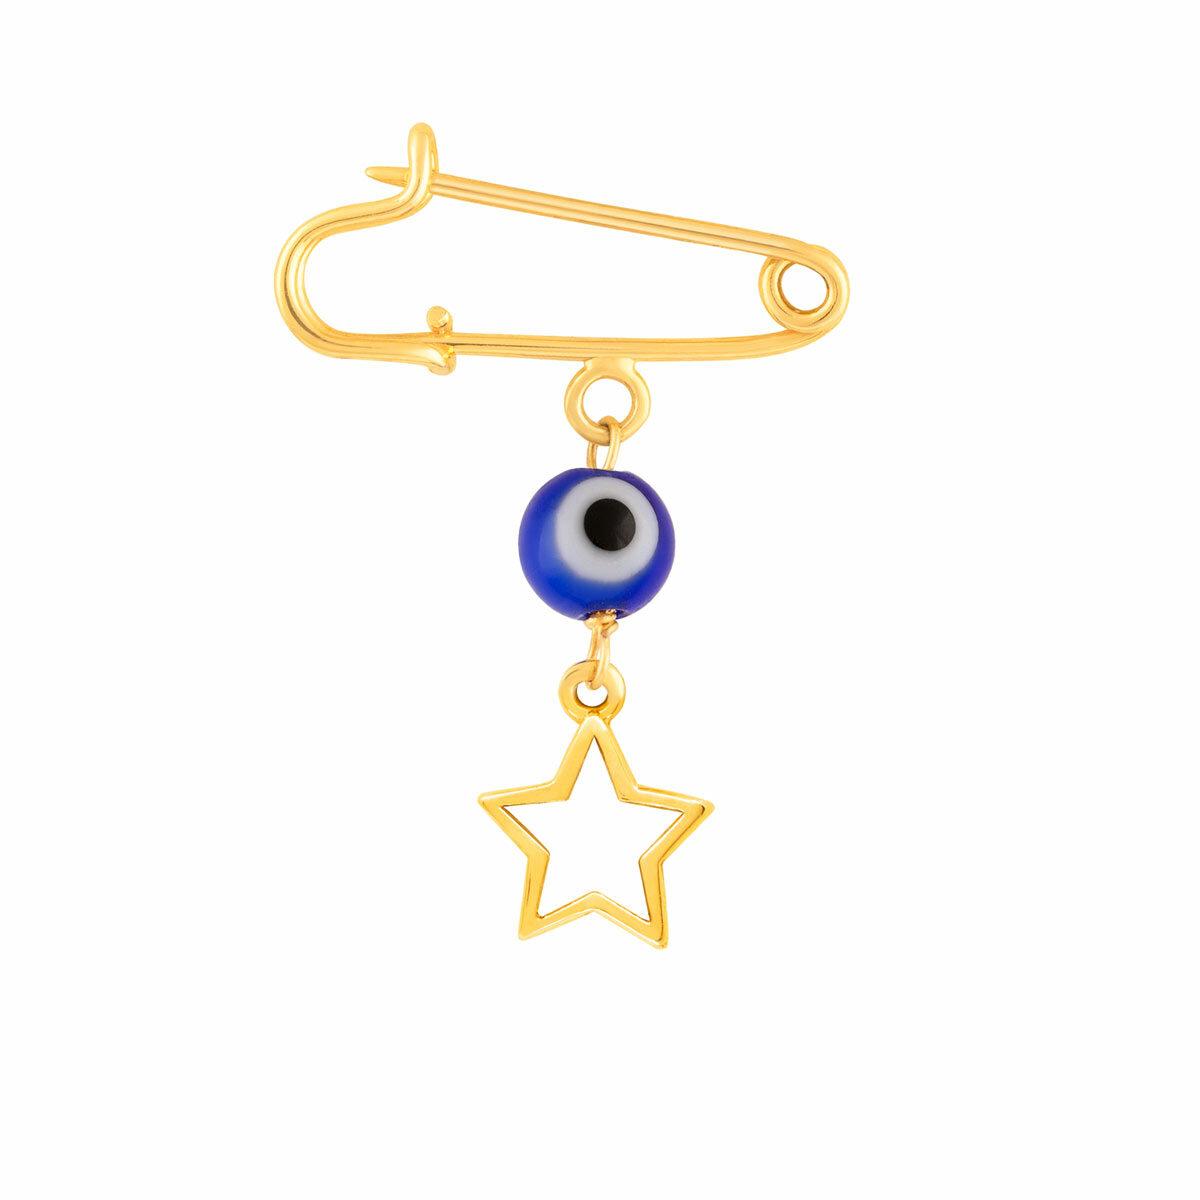 سنجاق سینه طلا بچه گانه ستاره توخالی